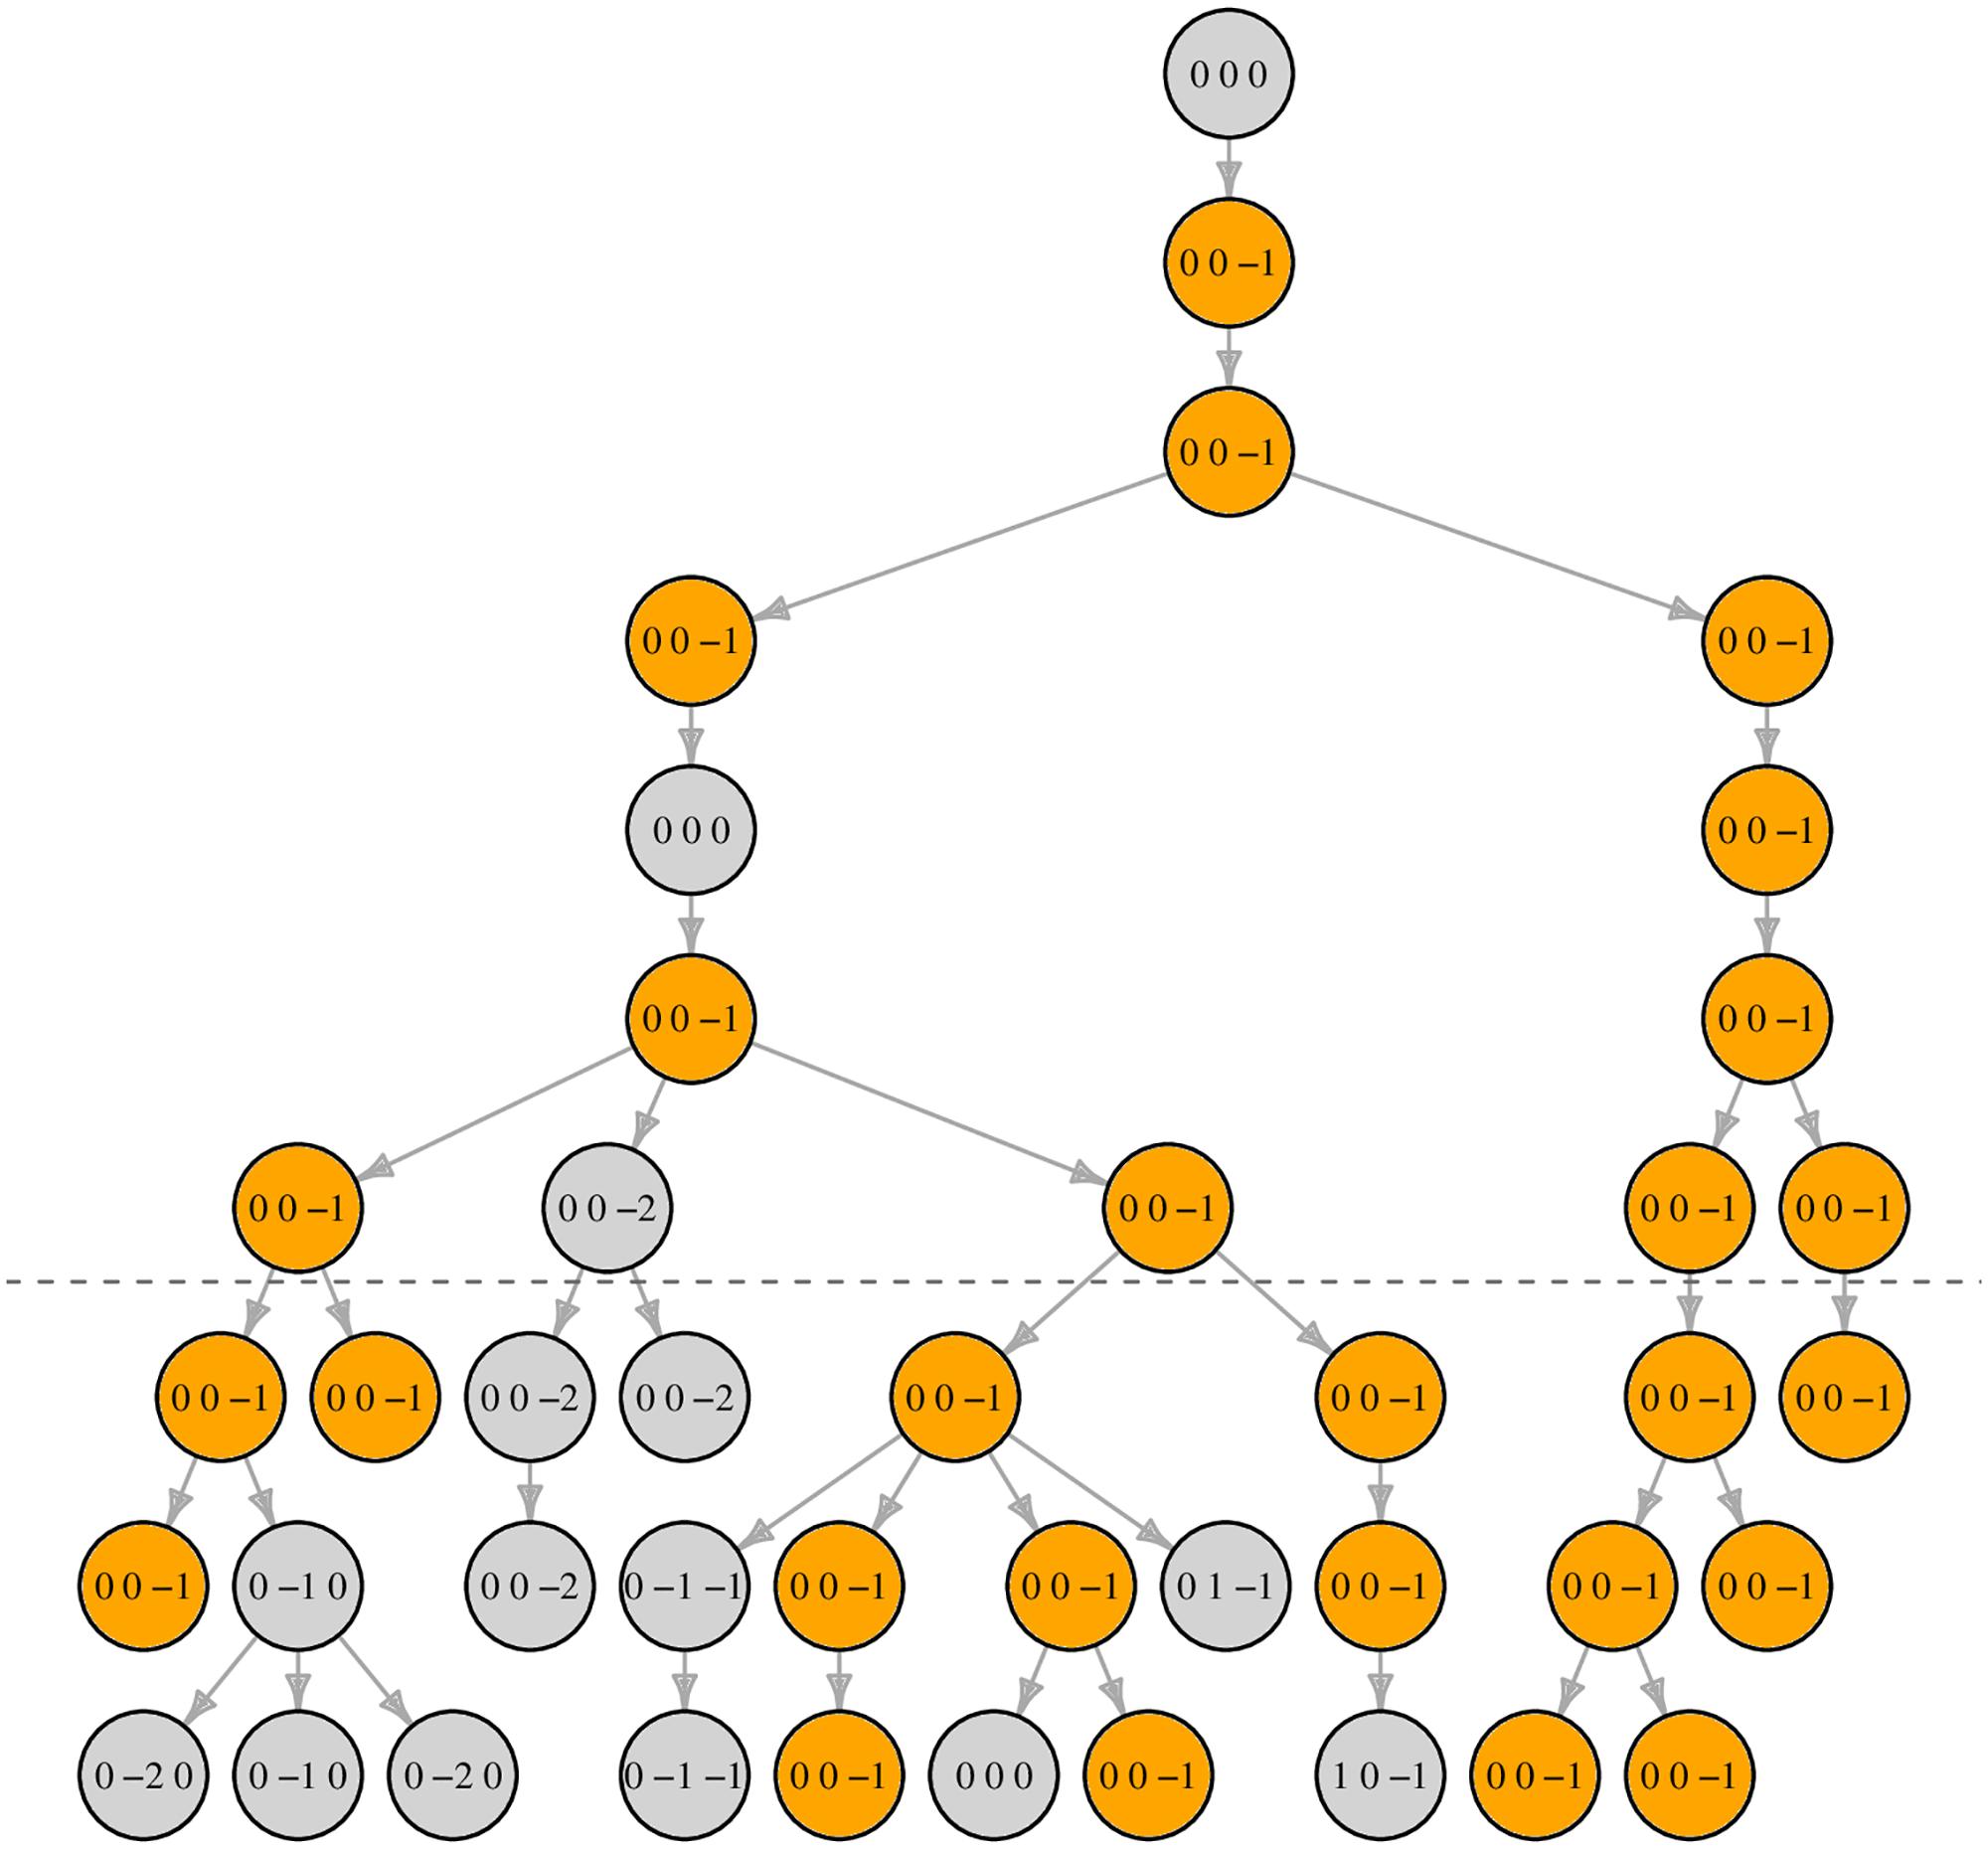 Simulation process illustrated.